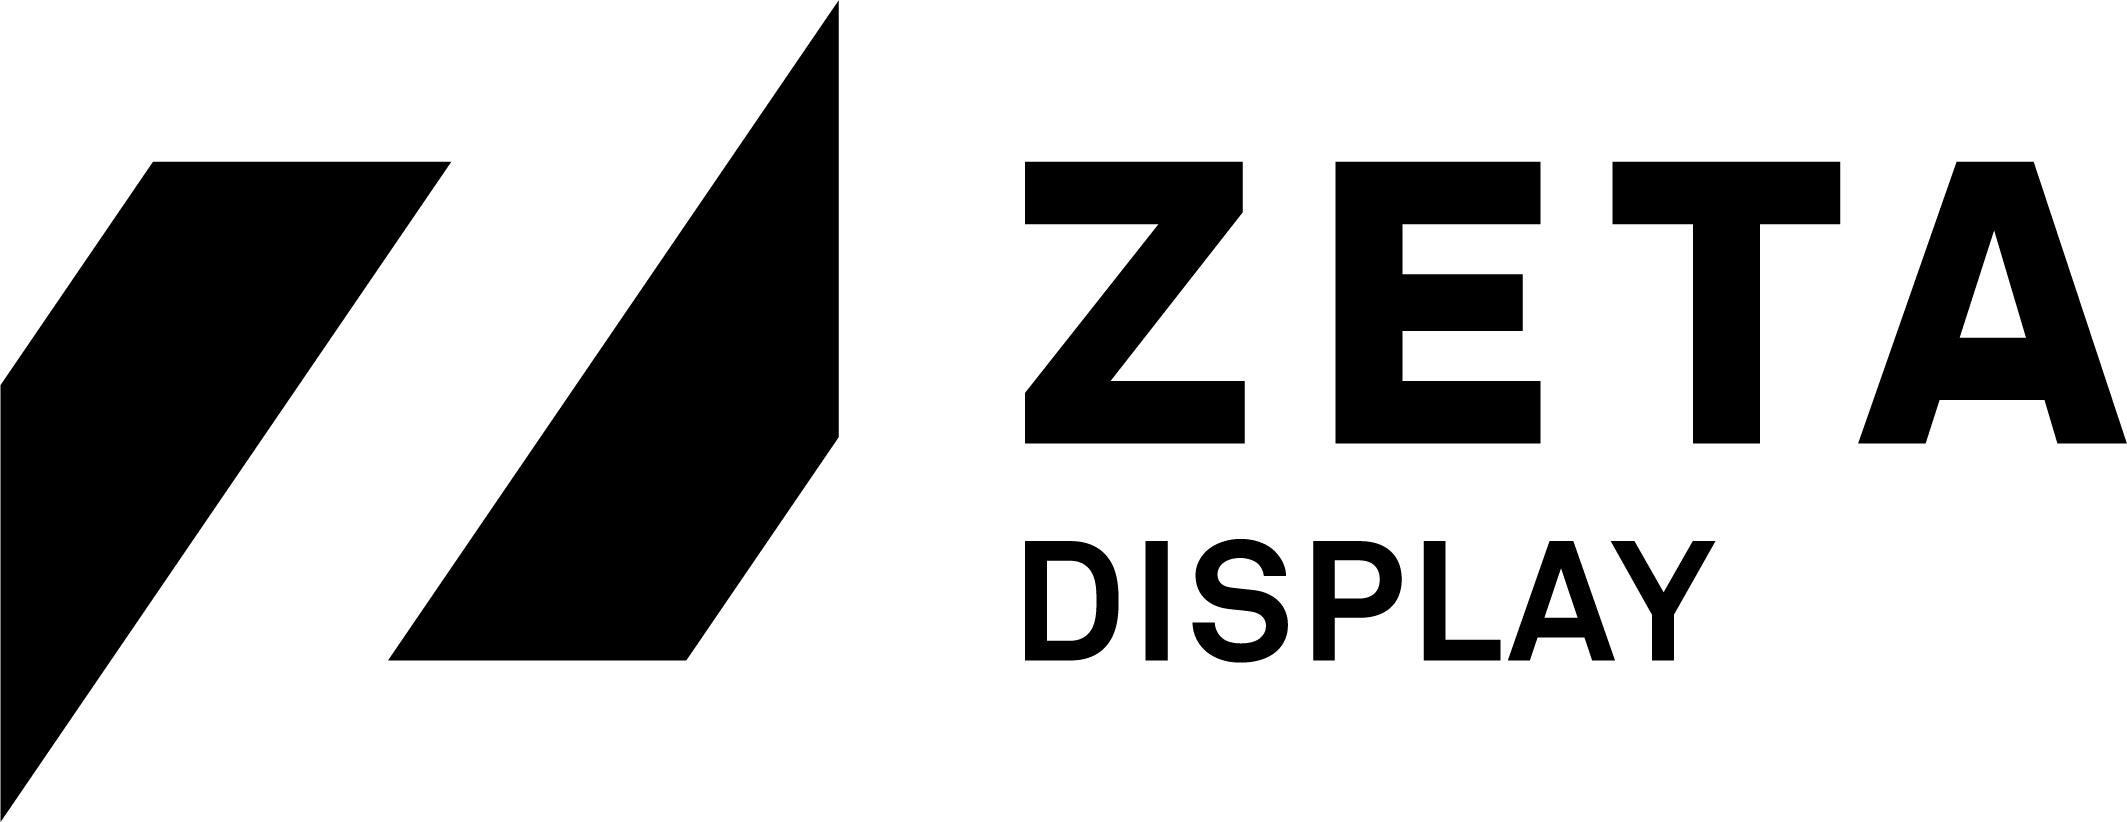 ZetaDisplay logo.